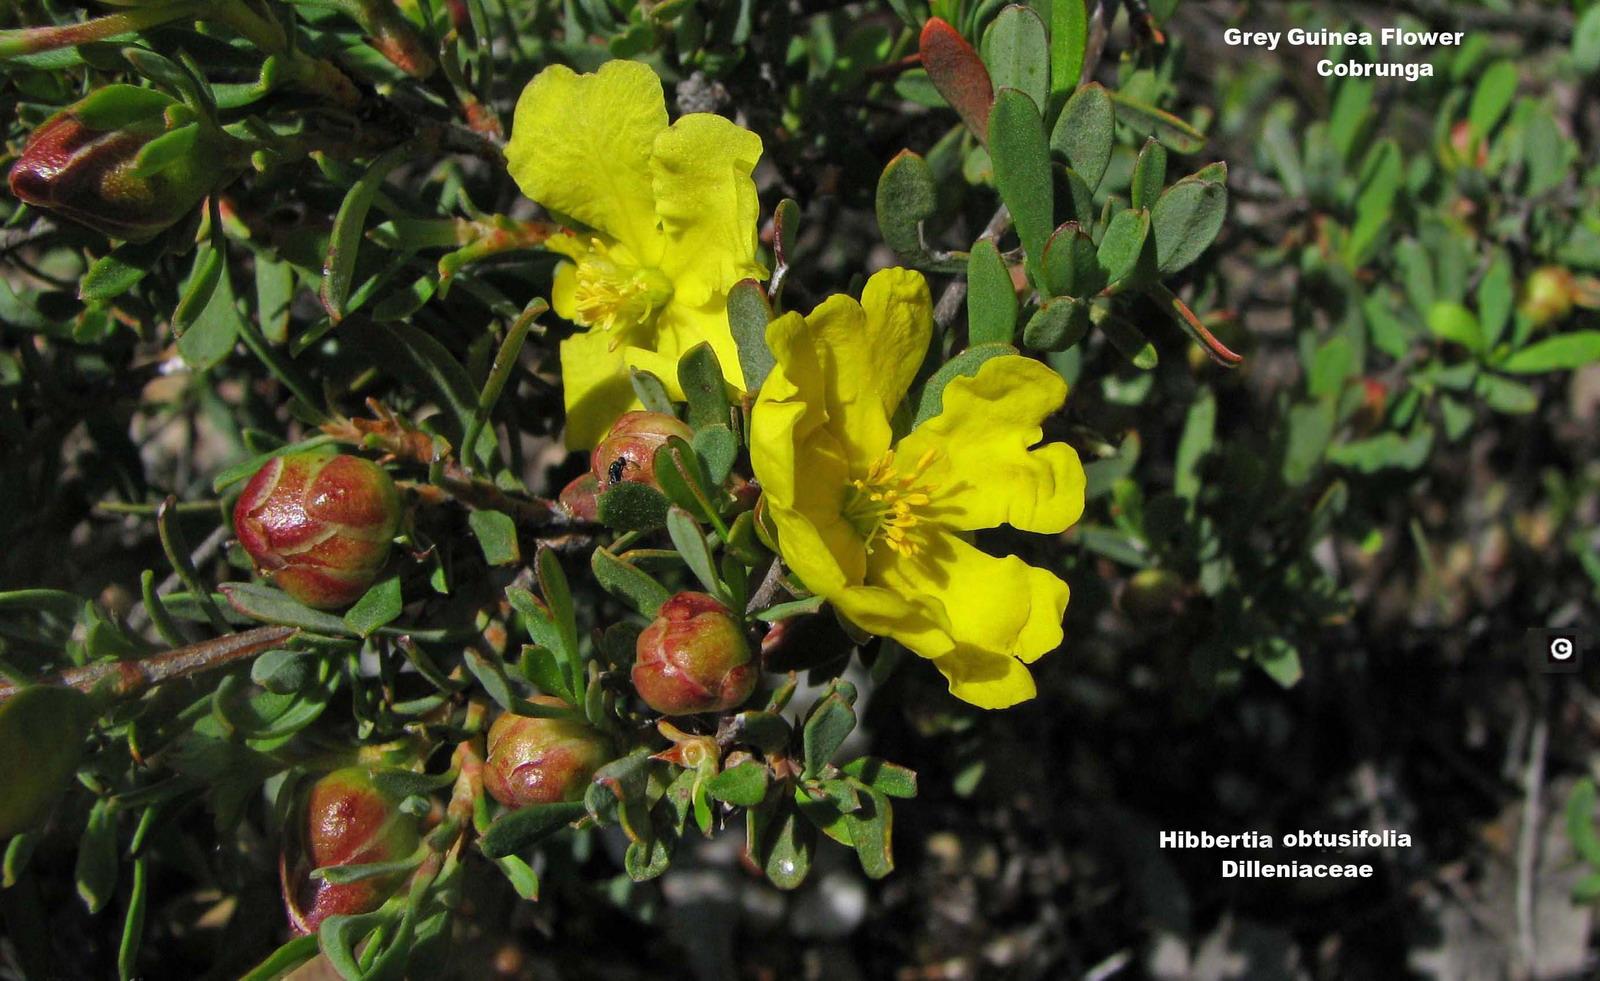 Hibbertia obtusifolia flora ALA source